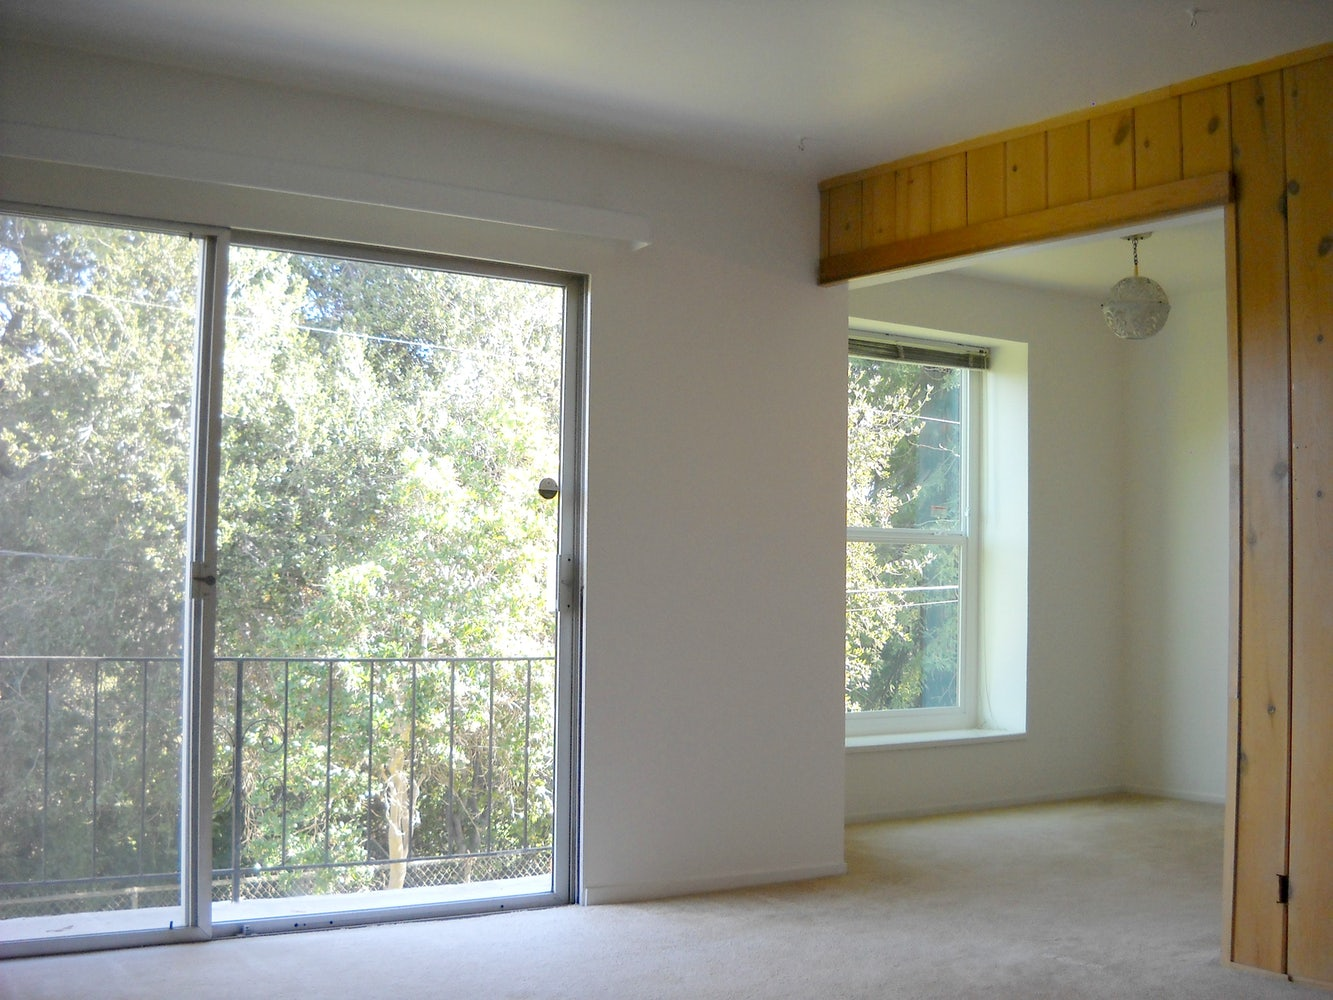 Ponderosa Ave, Unit C Sunnyvale, CA, 94086